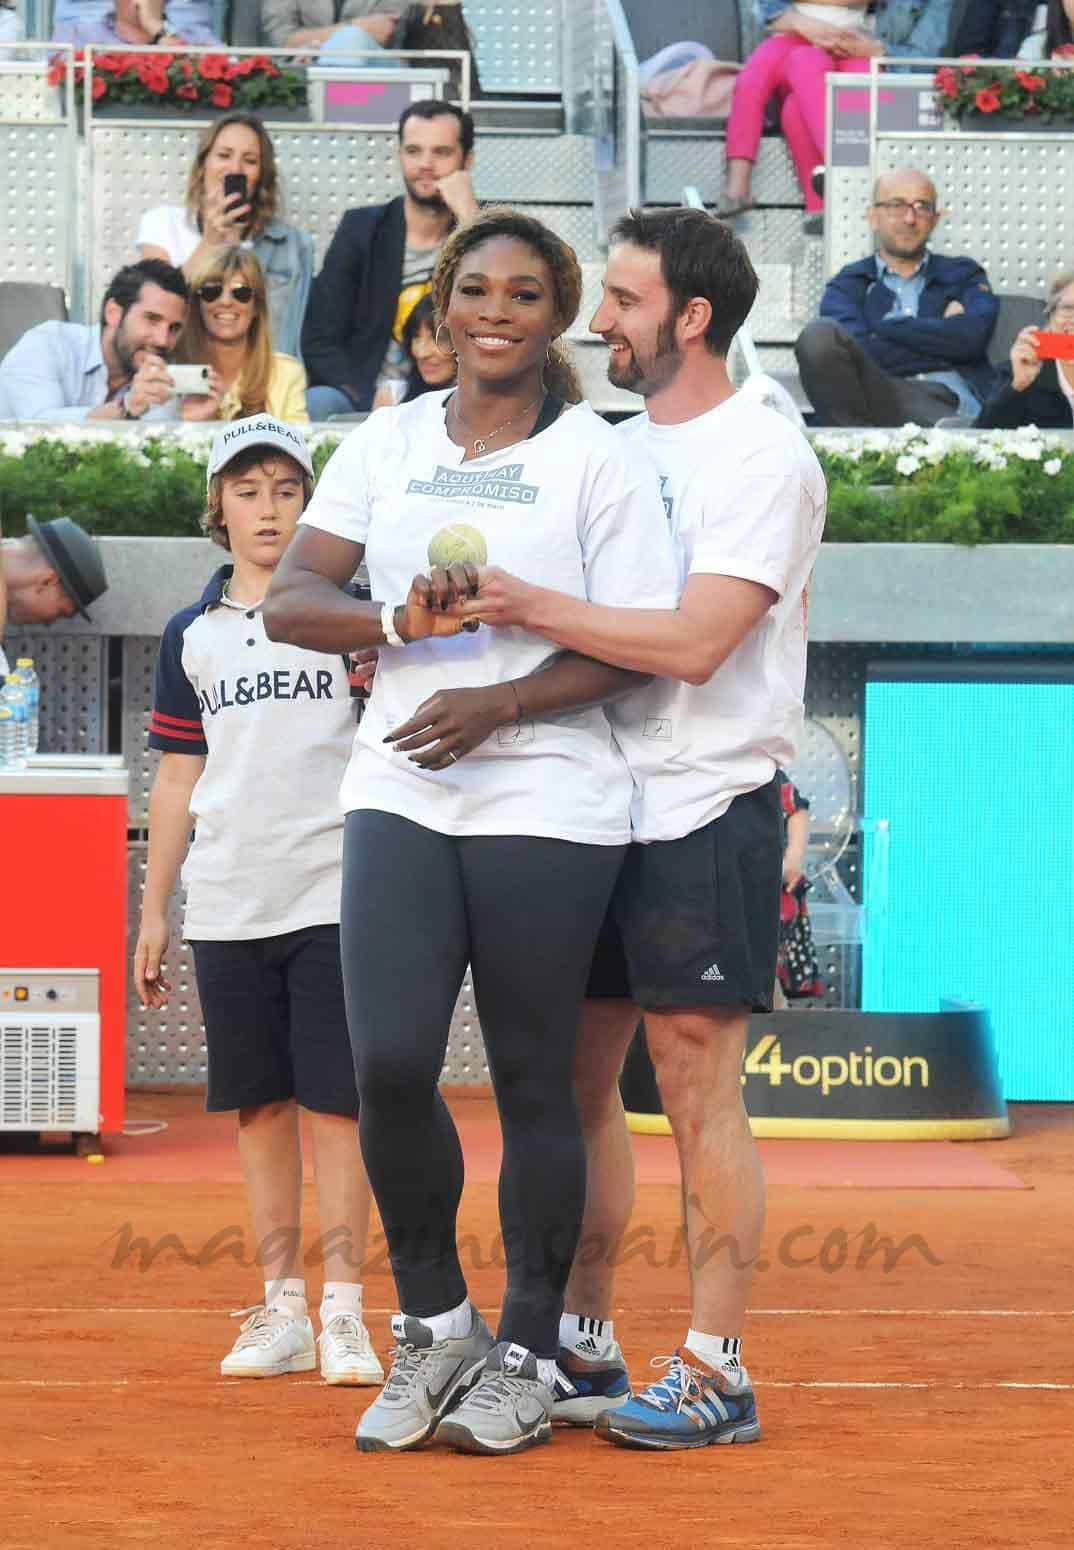 ¿Cuánto mide Dani Rovira? Dani-Rovira-y-Serena-Williams